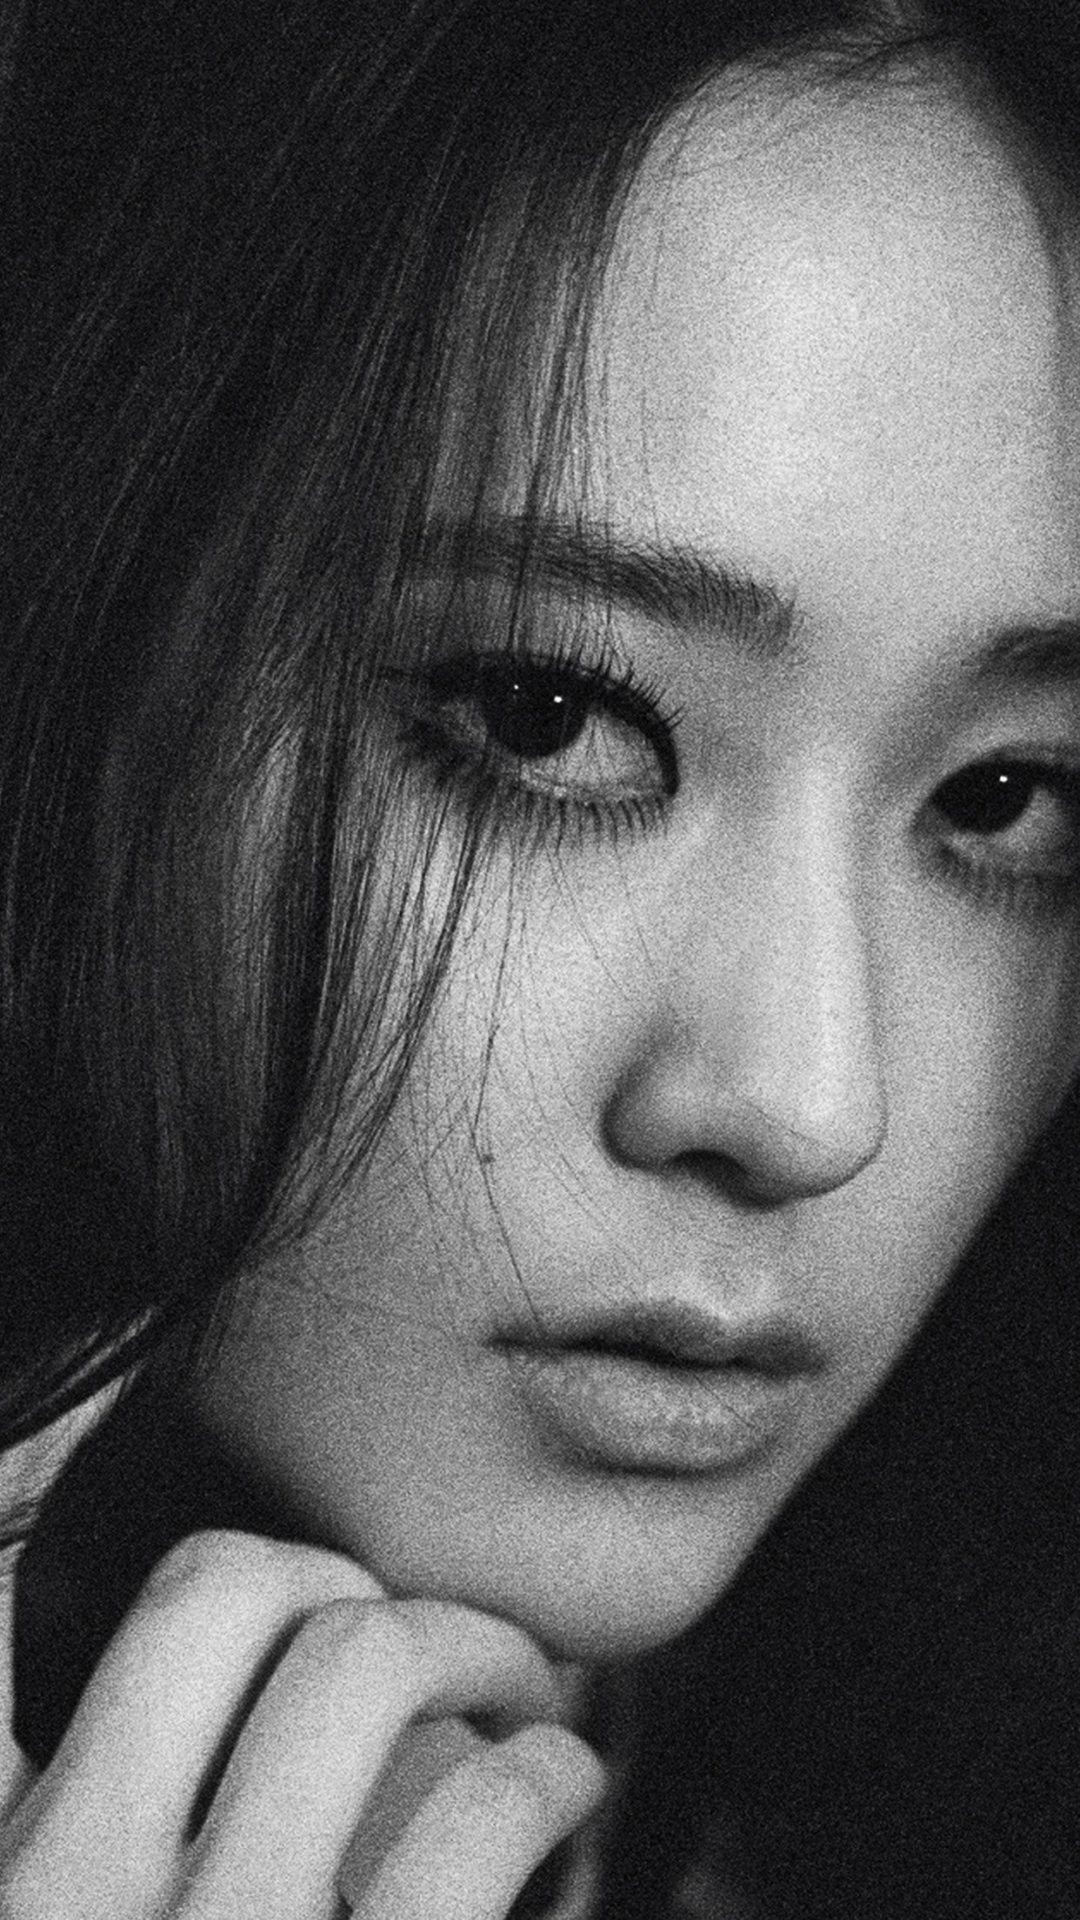 Victoria Kpop Girl Face Music